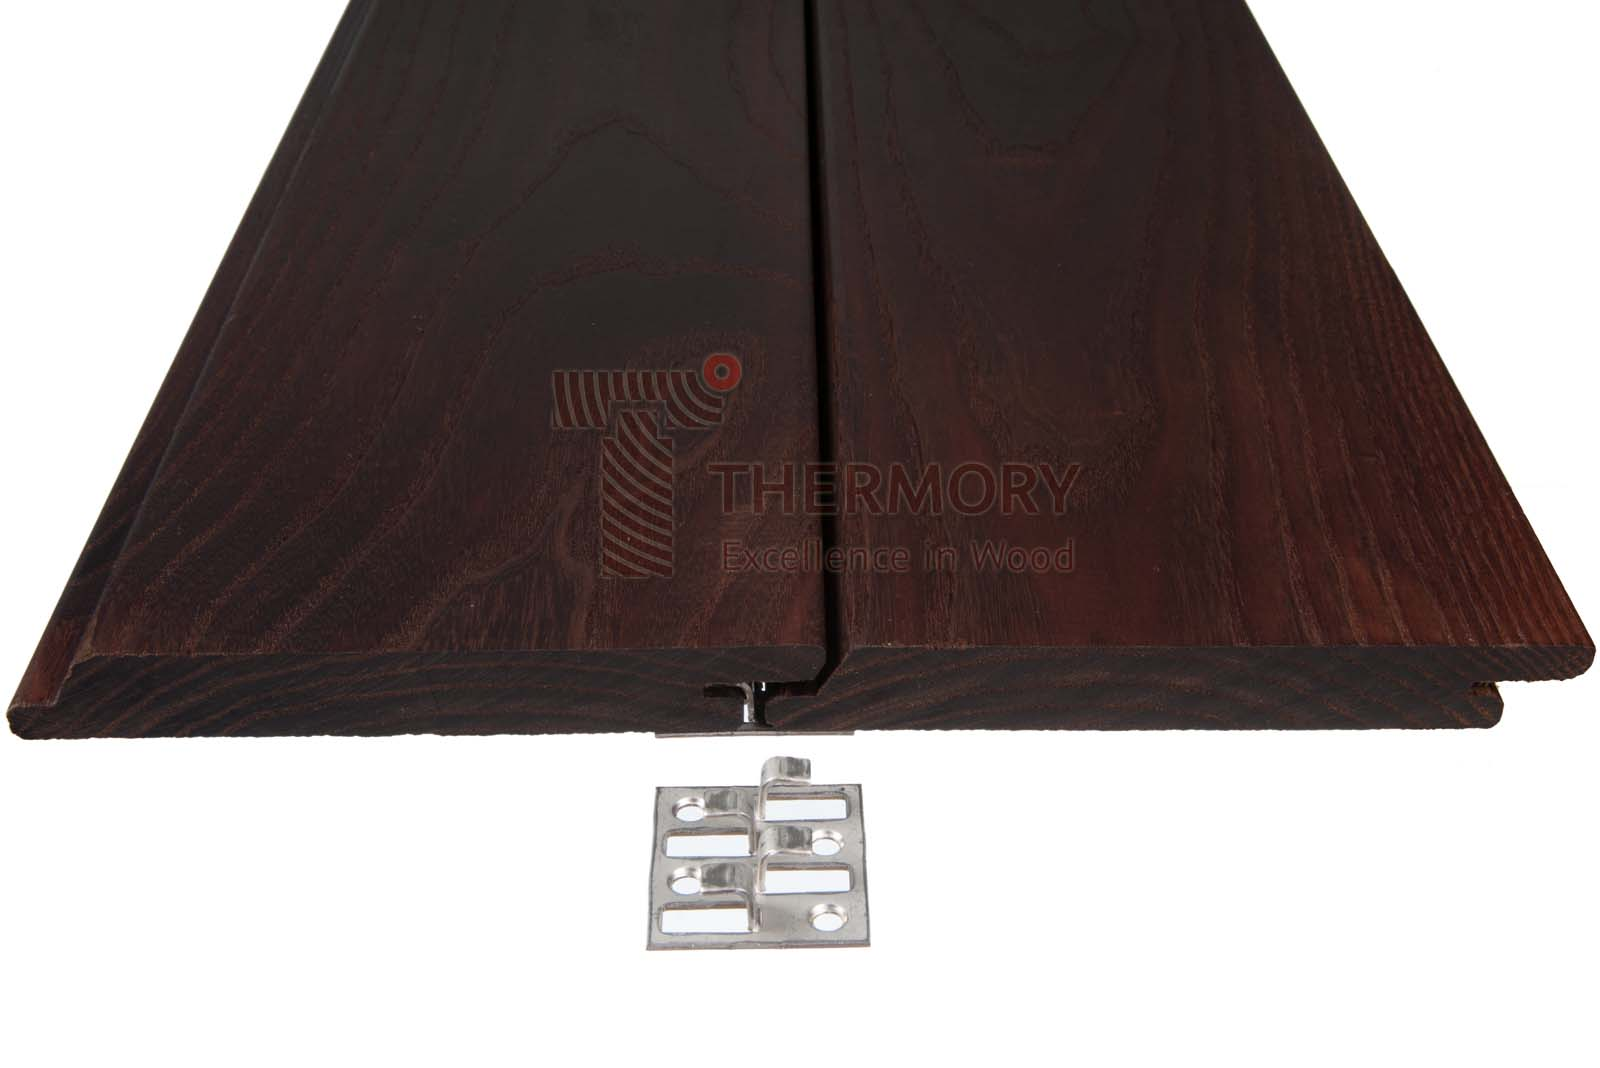 C6 20x155mm Thermory Ash incl.clip B1-1 (Dubai).jpg